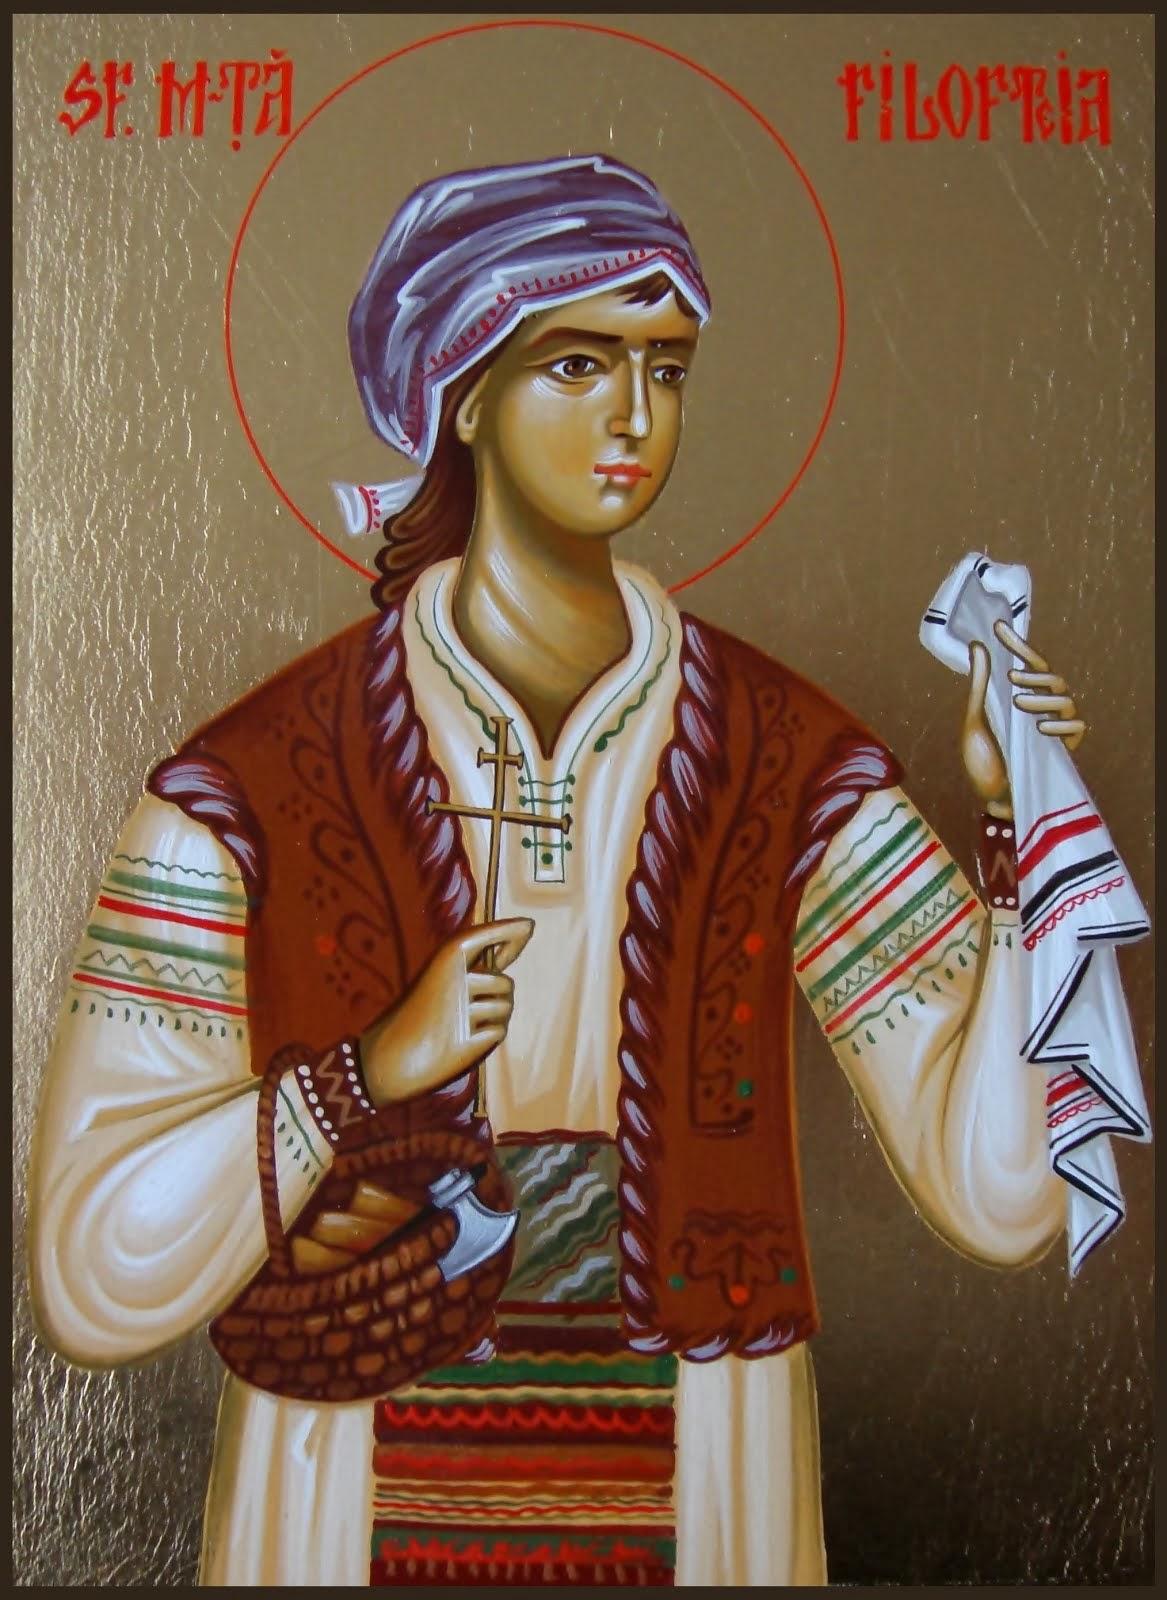 Azi 7 decembrie praznuirea Sfintei Mucenite Filoteia !